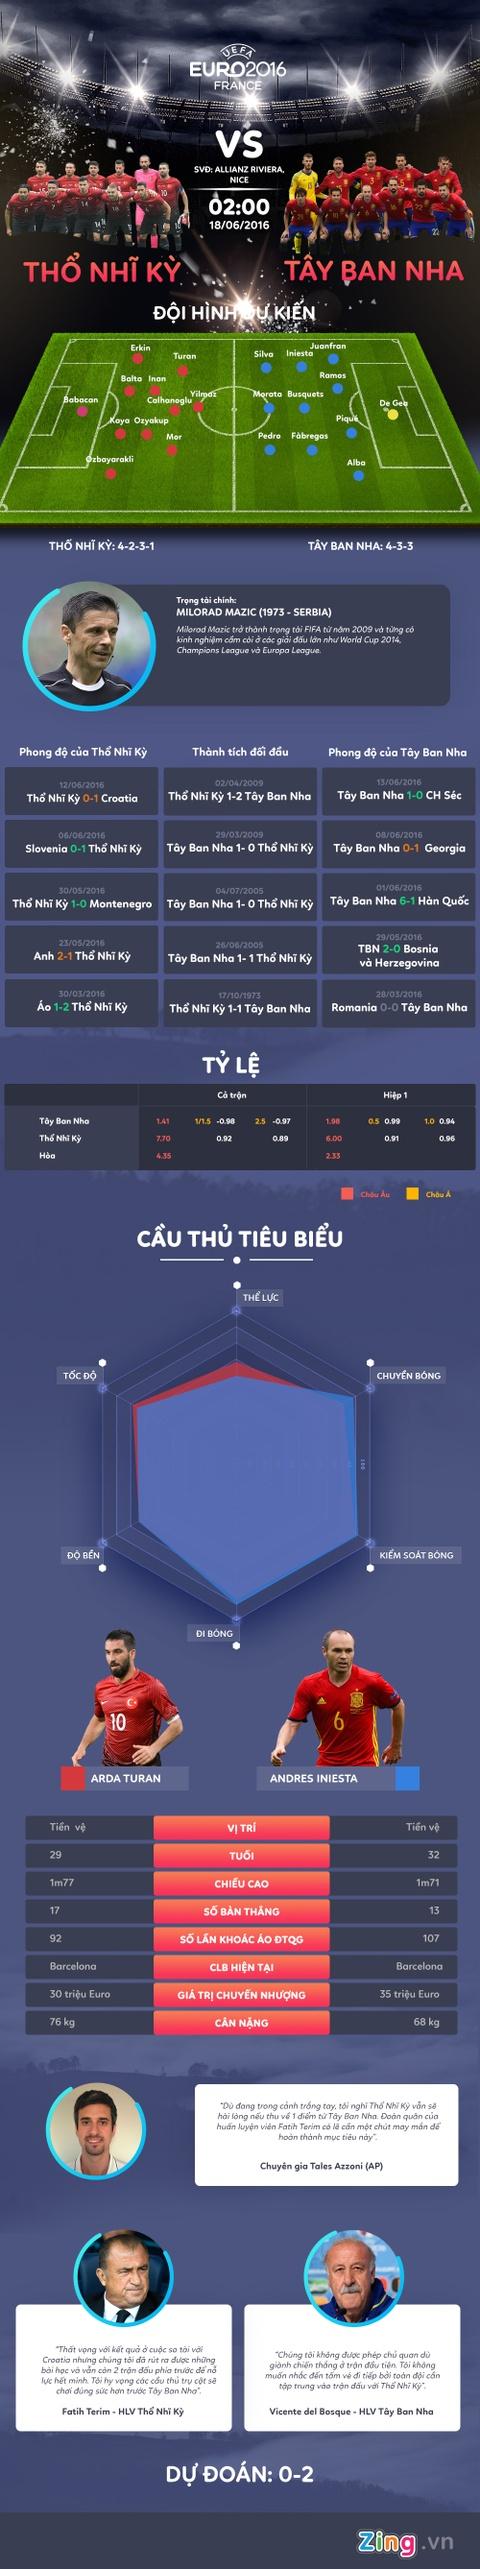 Tay Ban Nha vs Tho Nhi Ky: Kho can nha vua hinh anh 1